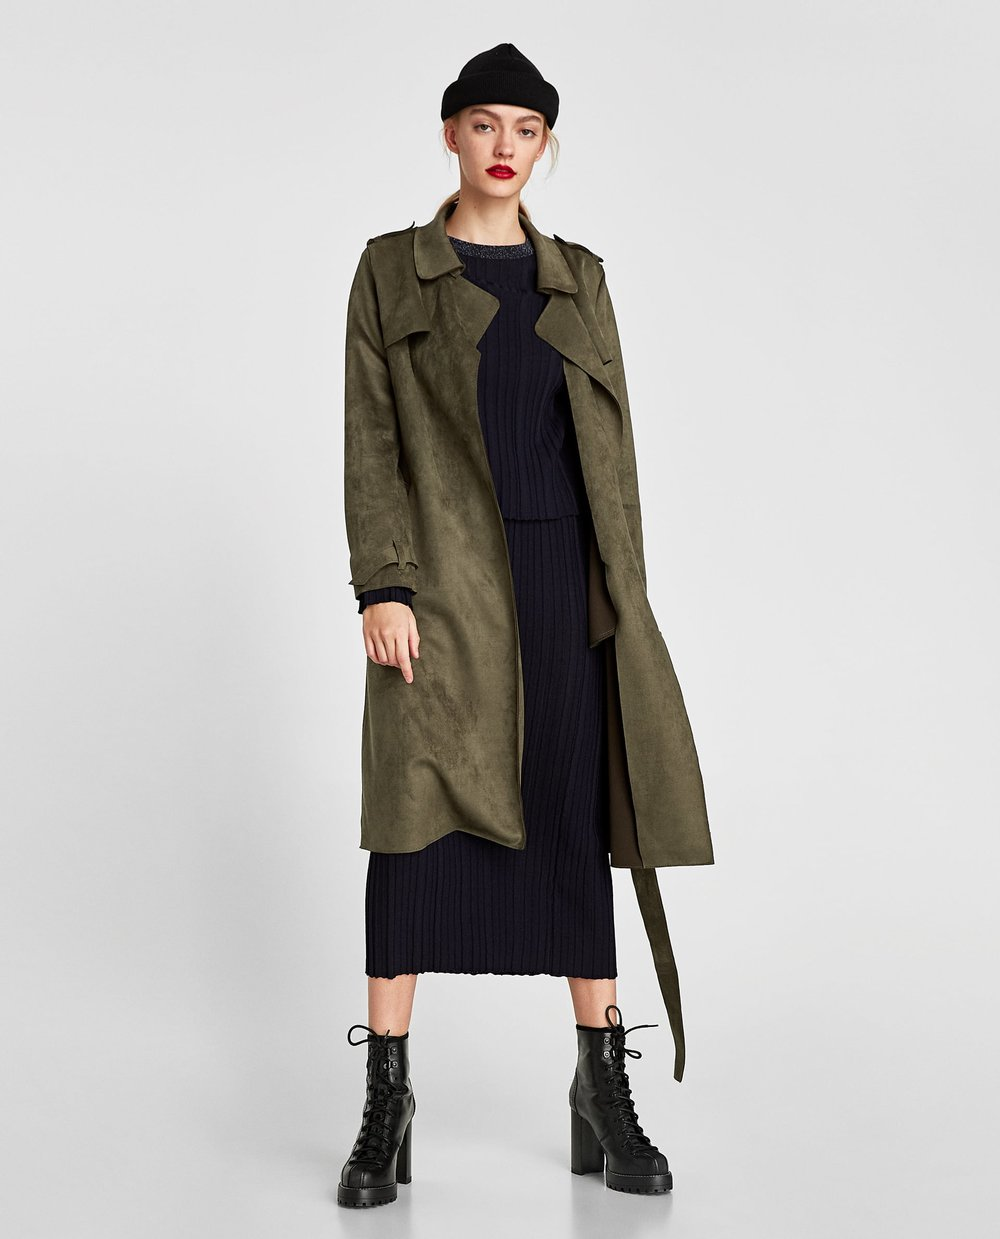 FAUX SUEDE TRENCH COAT. Zara. $89.